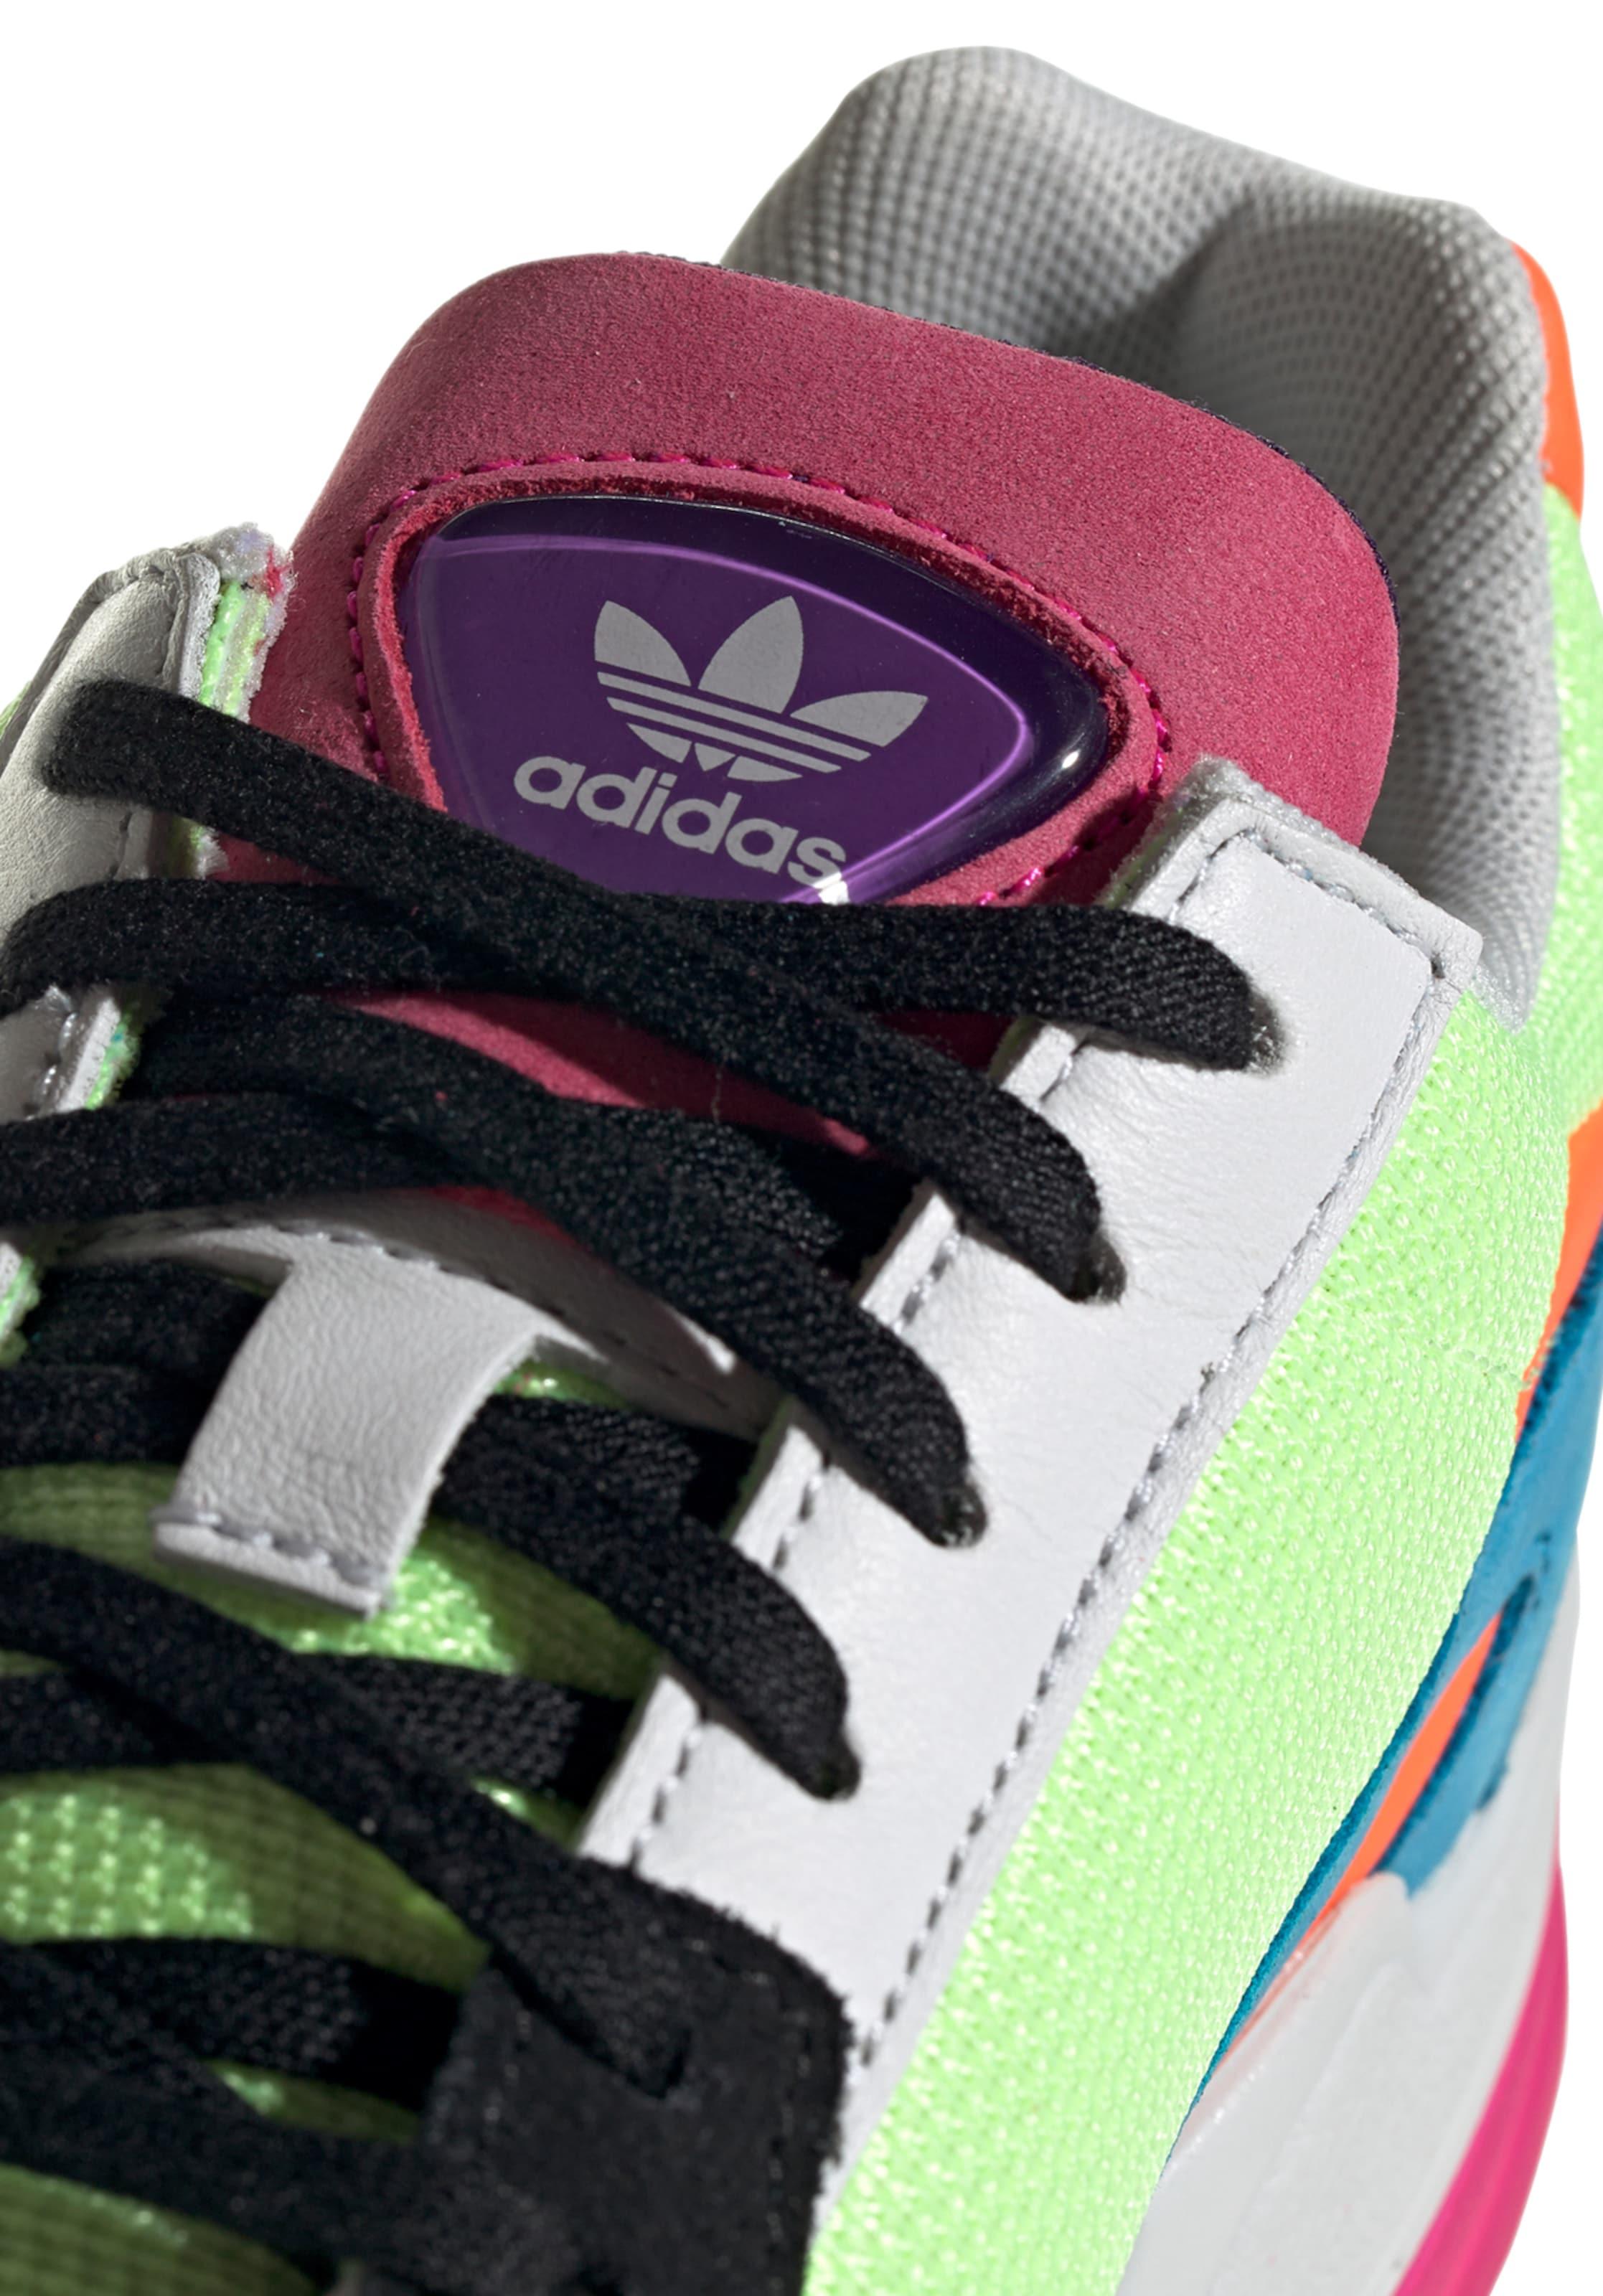 In Schwarz 'falcon' HellblauHellgrau Kiwi Adidas Sneaker Originals Dunkelorange b7g6yf